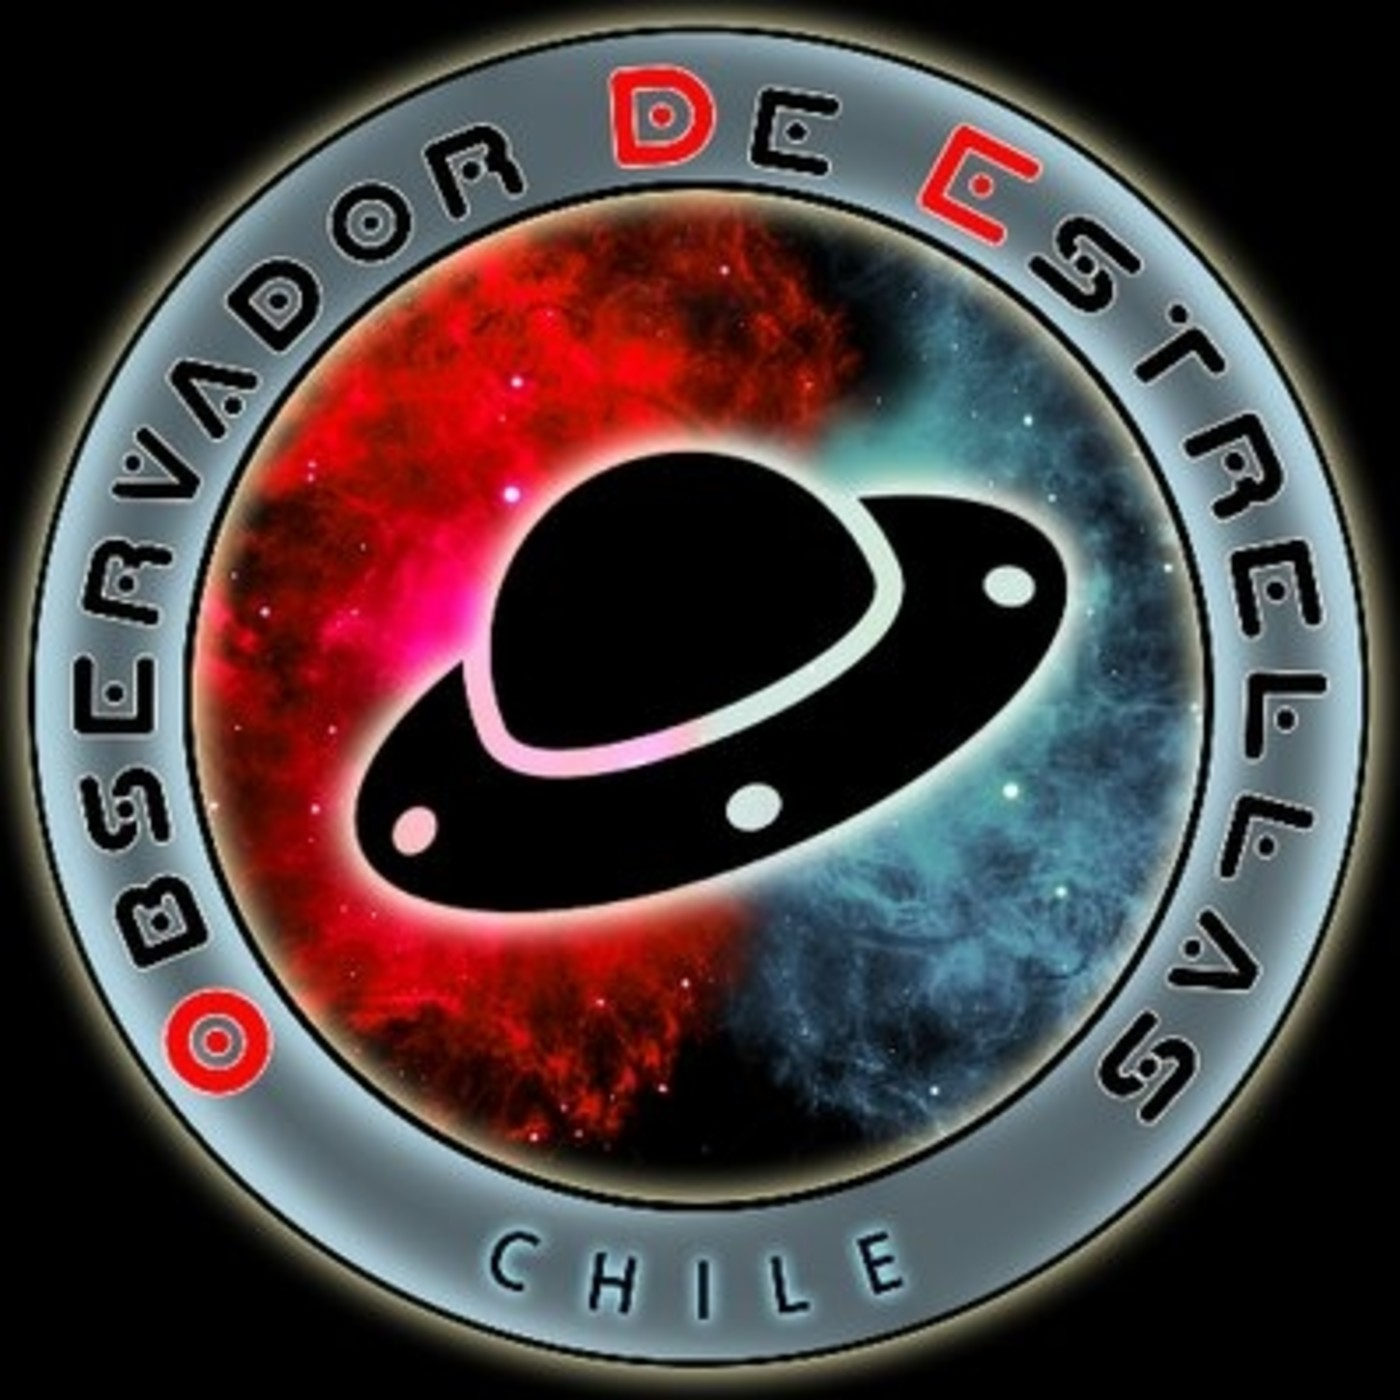 Escucha Observador De Estrellas Chile Ivoox